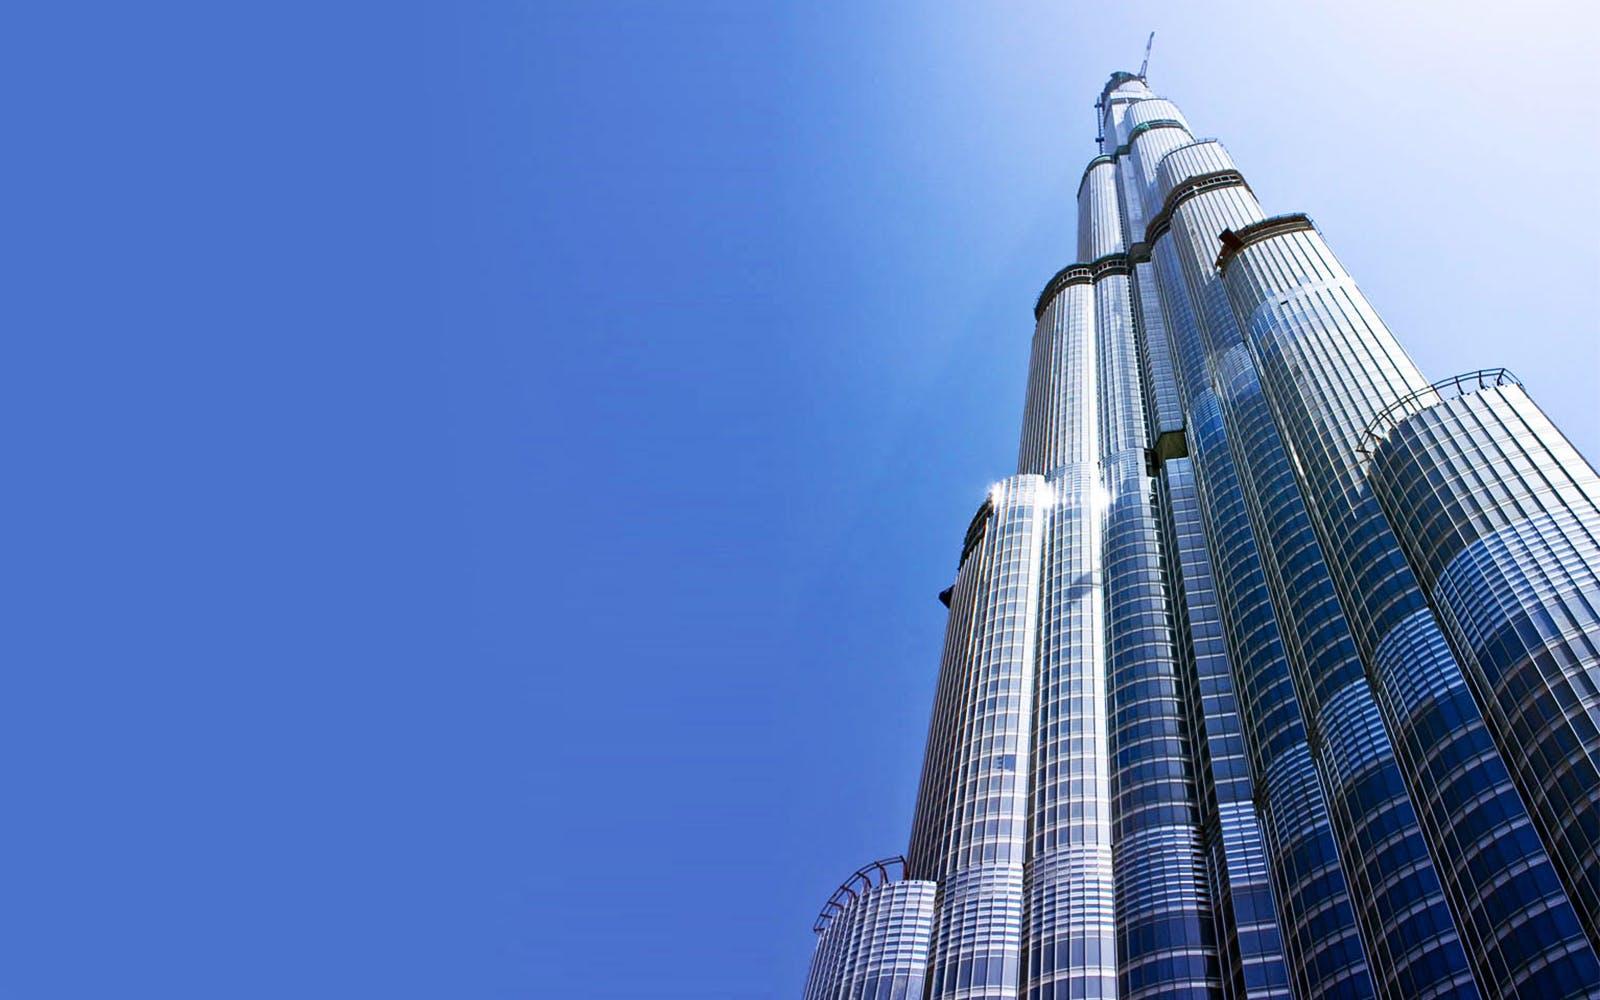 Best Places to Visit in Dubai - Burj khalifa - 2